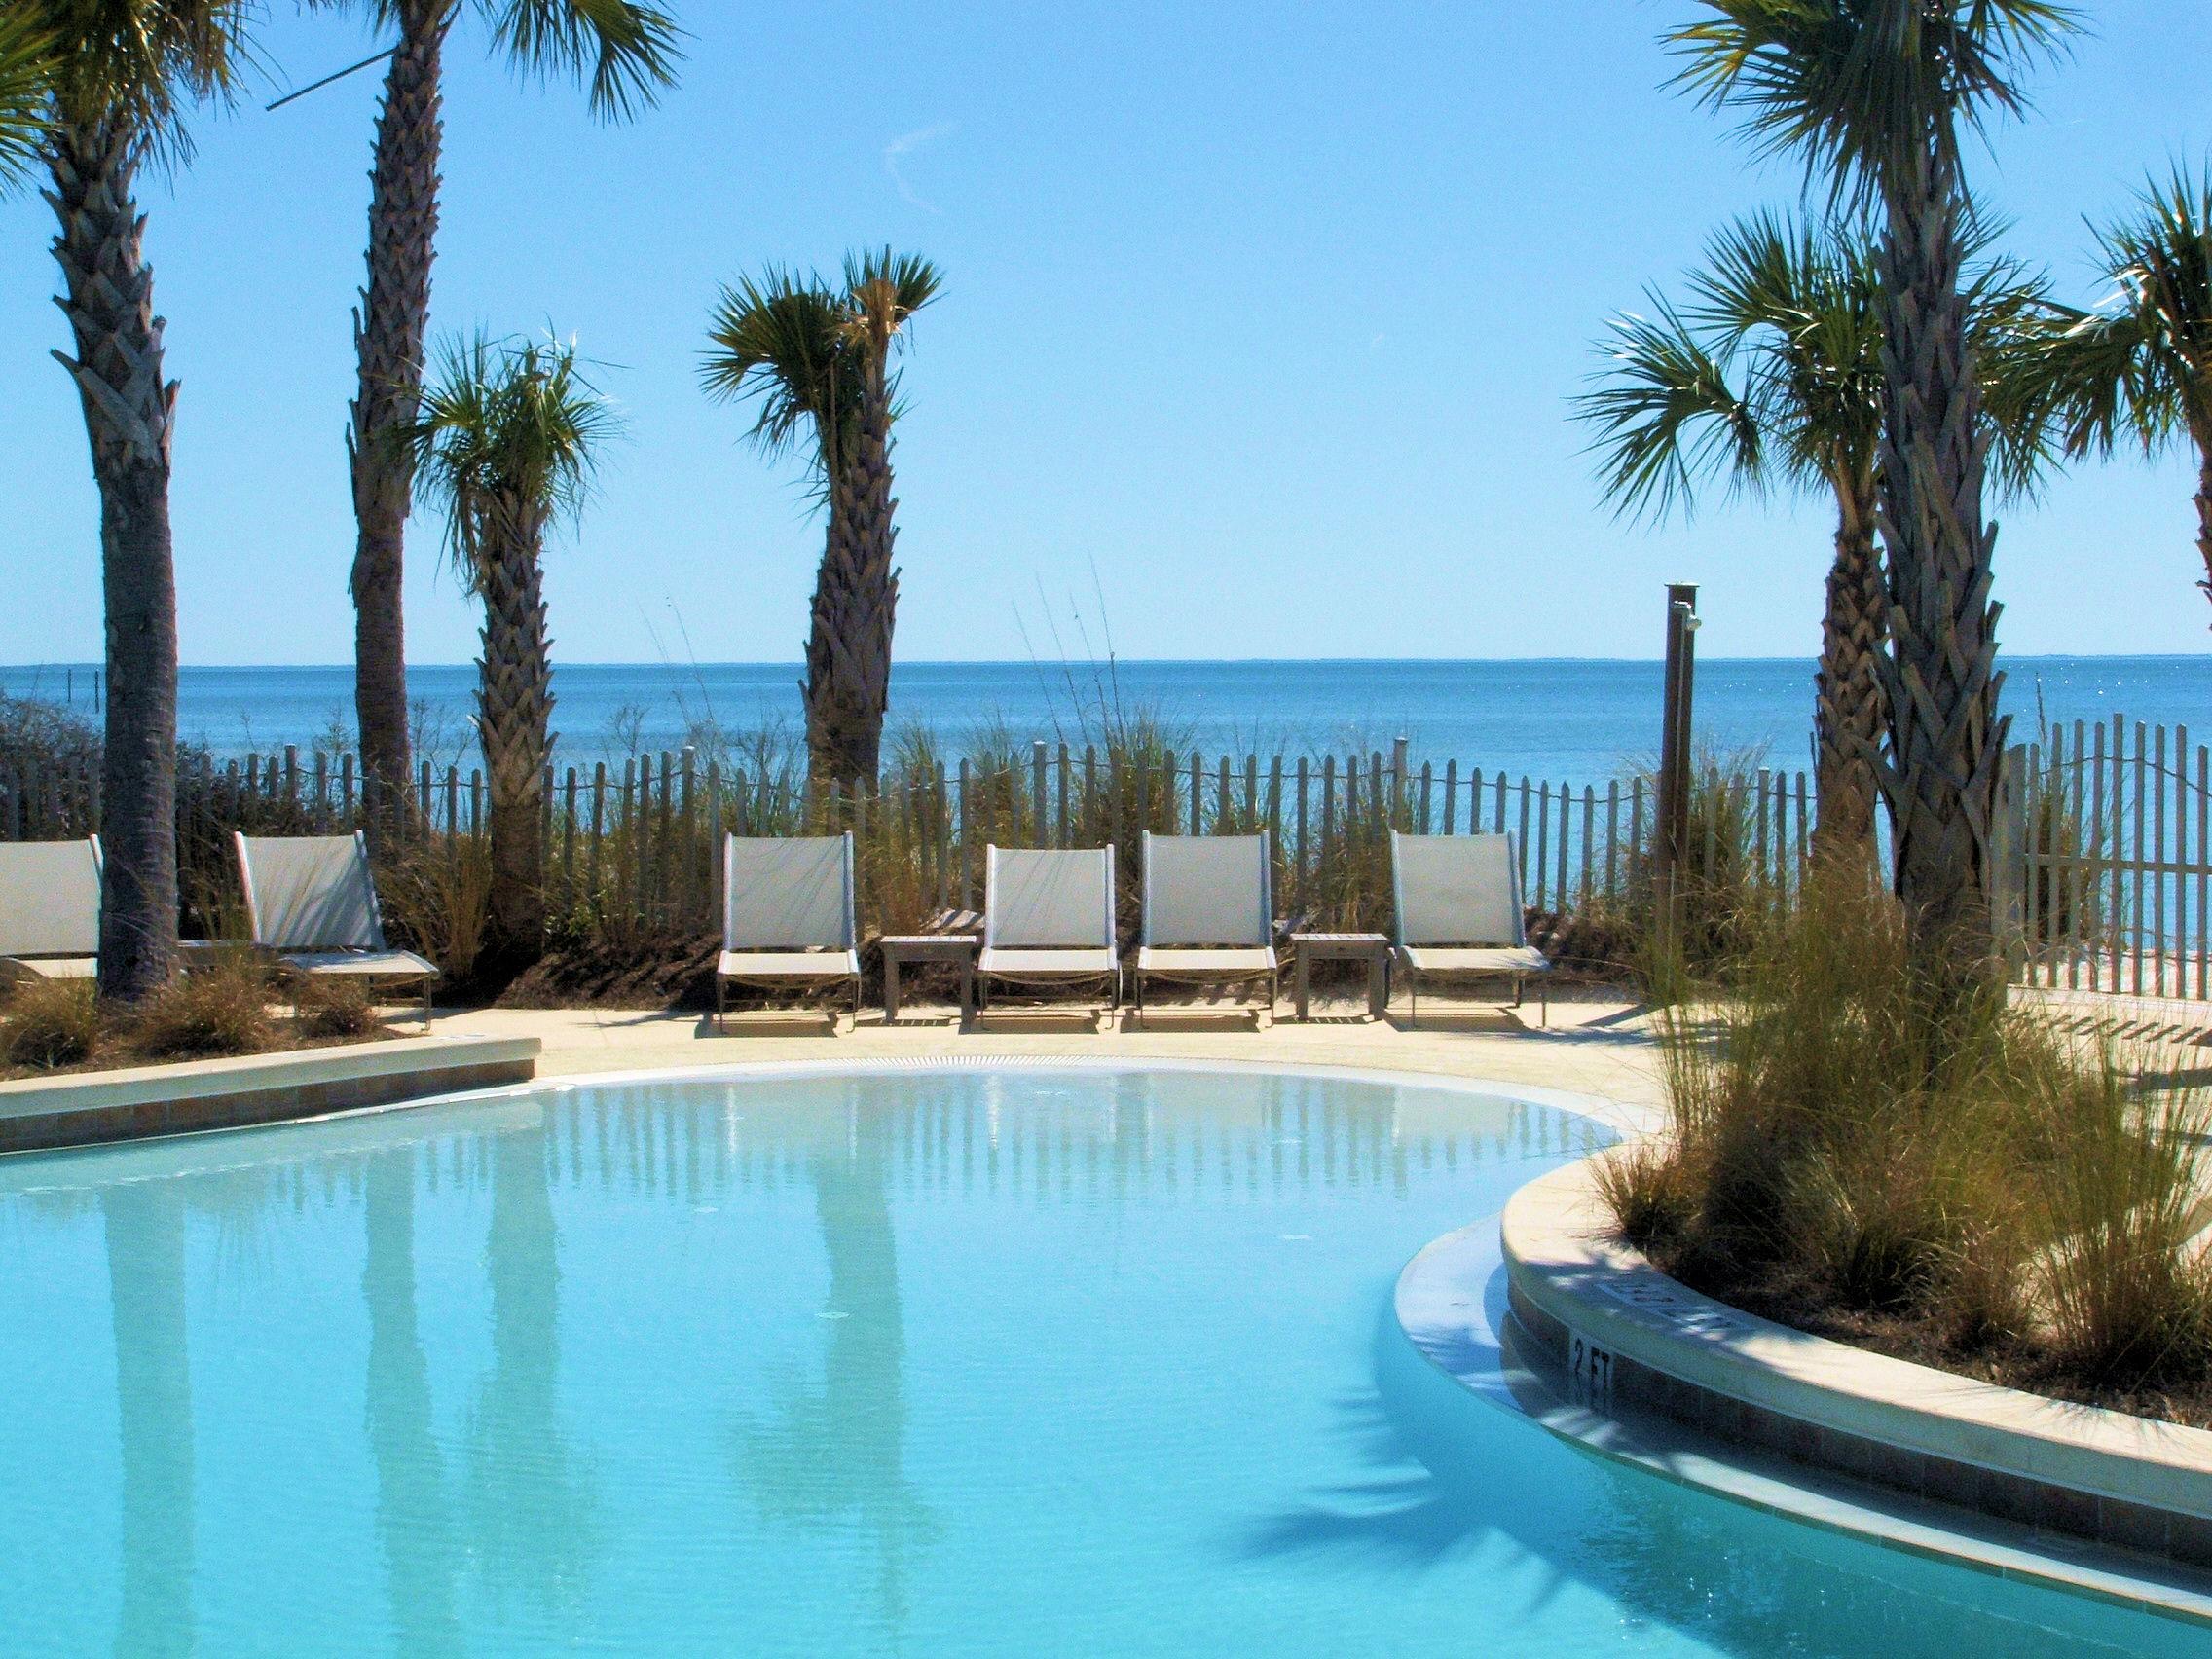 Natalie Shoaf Real Estate For Mexico Beach Cape San Blas